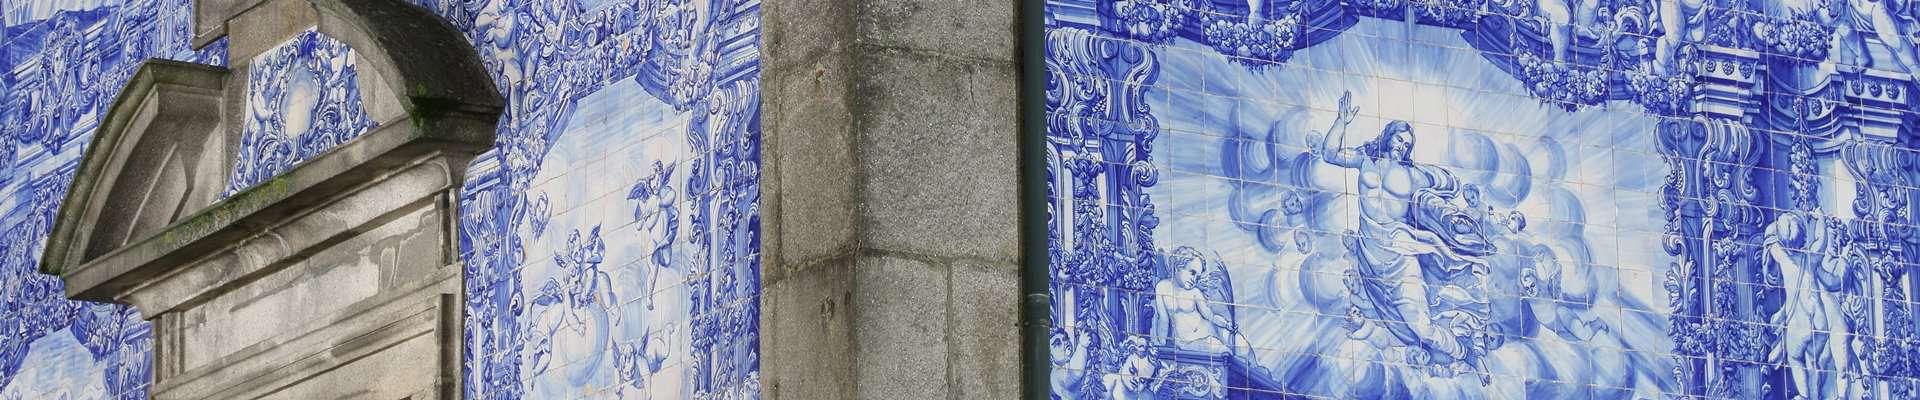 Blue tiles on the exterior walls of Capela das Almas in Porto, Portugal.